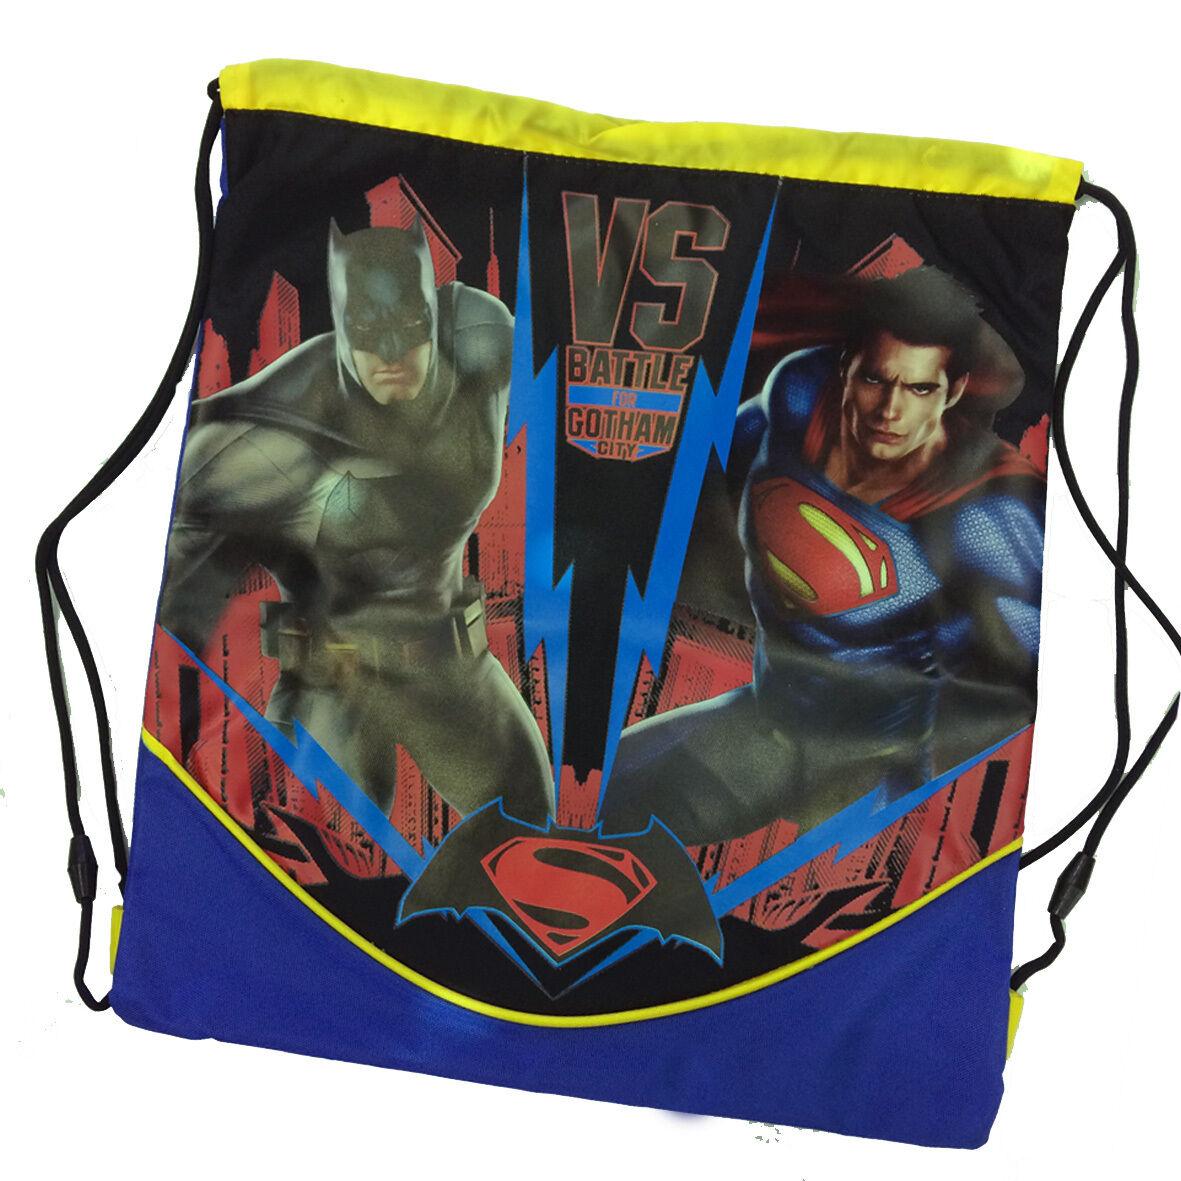 BATMAN VS SUPERMAN Sacca zaino coulisse in cordura pesante 40x36 cm by panini